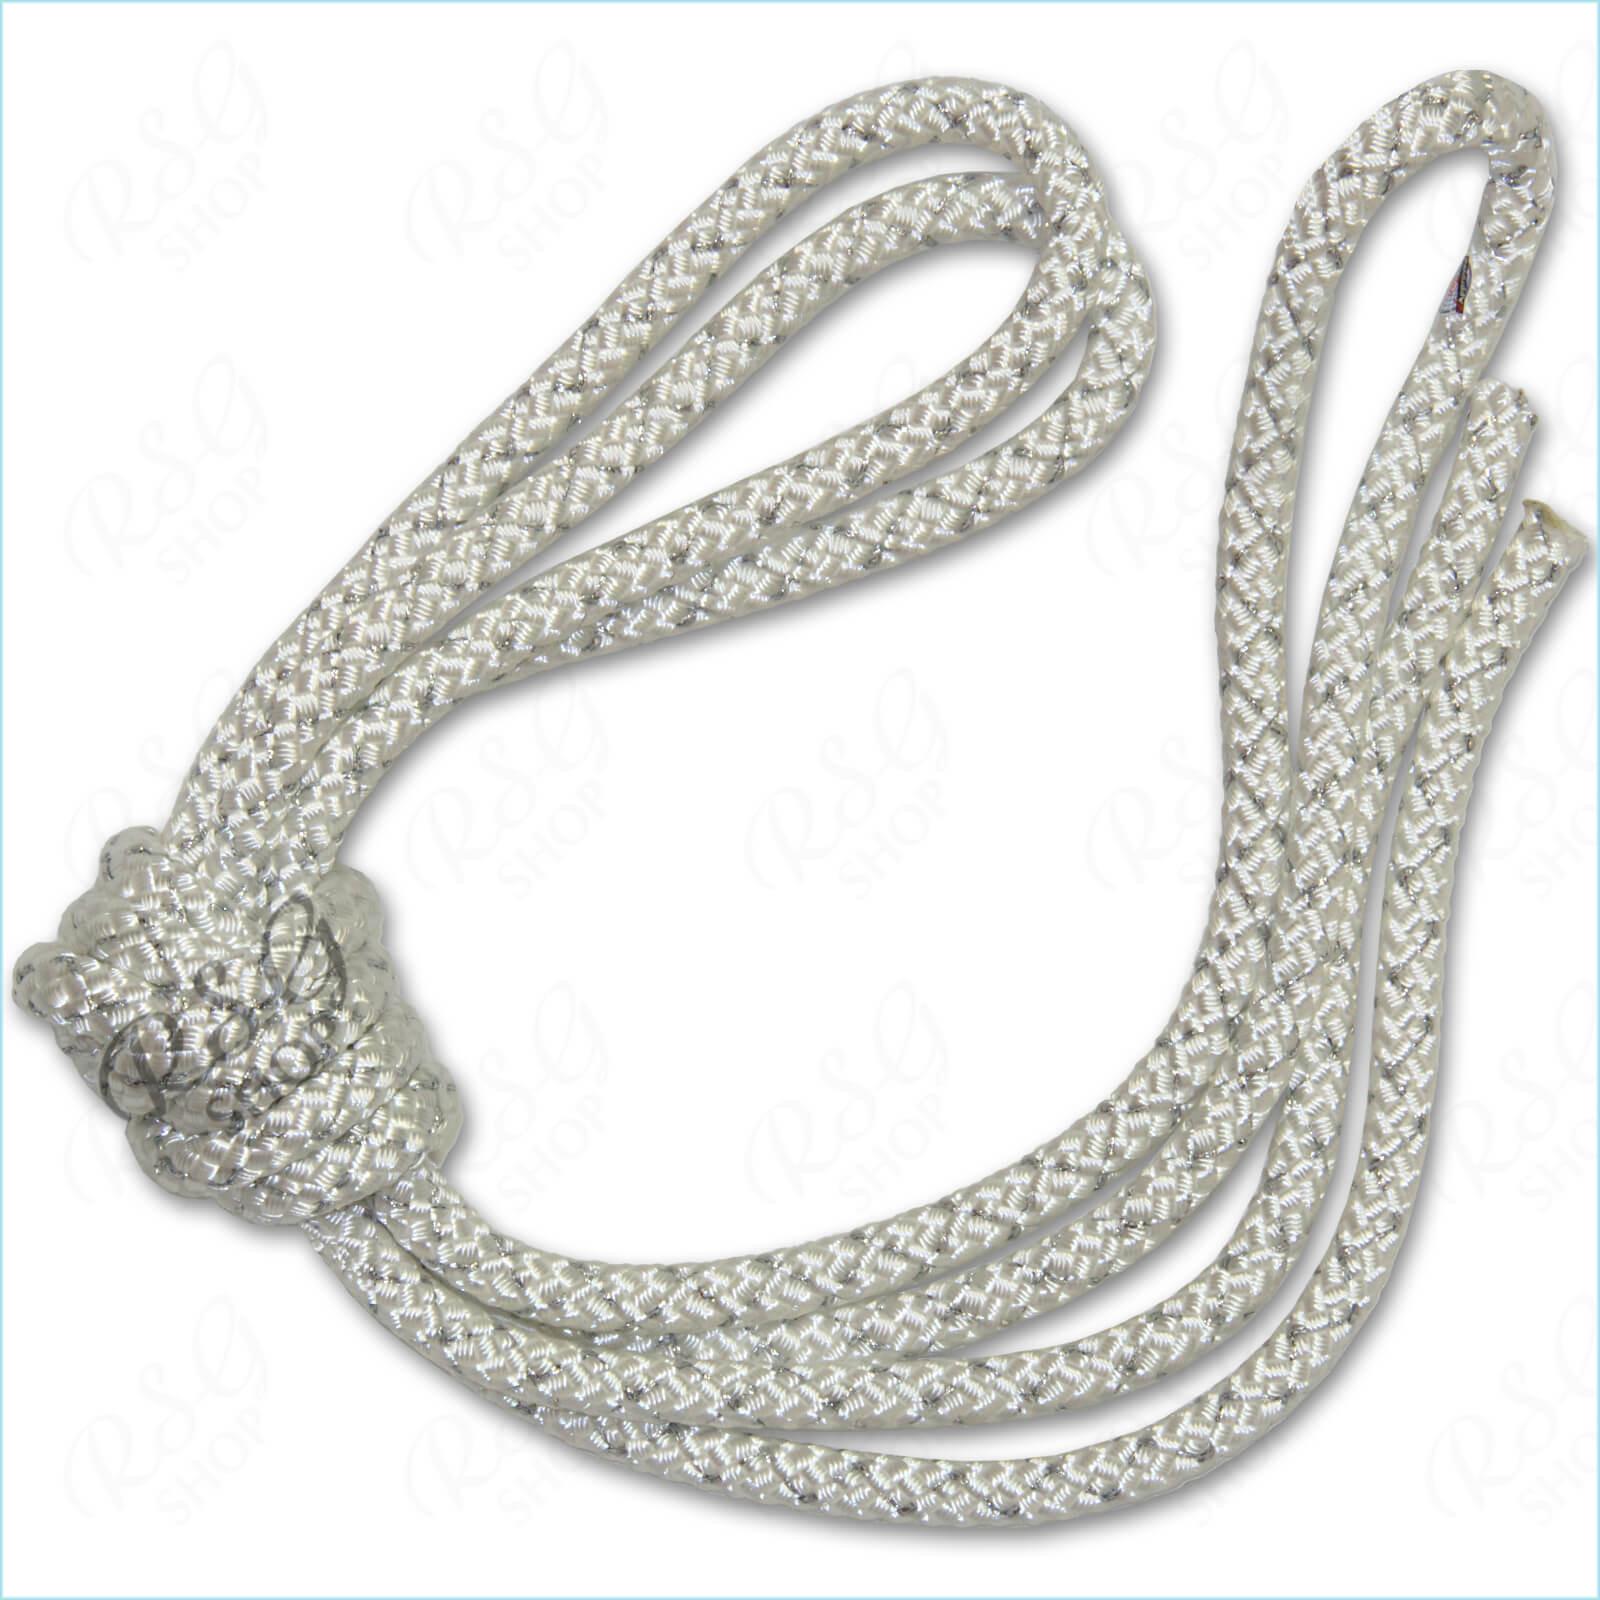 Скакалка 3м Pastorelli Metal цвет Белый-Серебряный FIG Артикул 03456